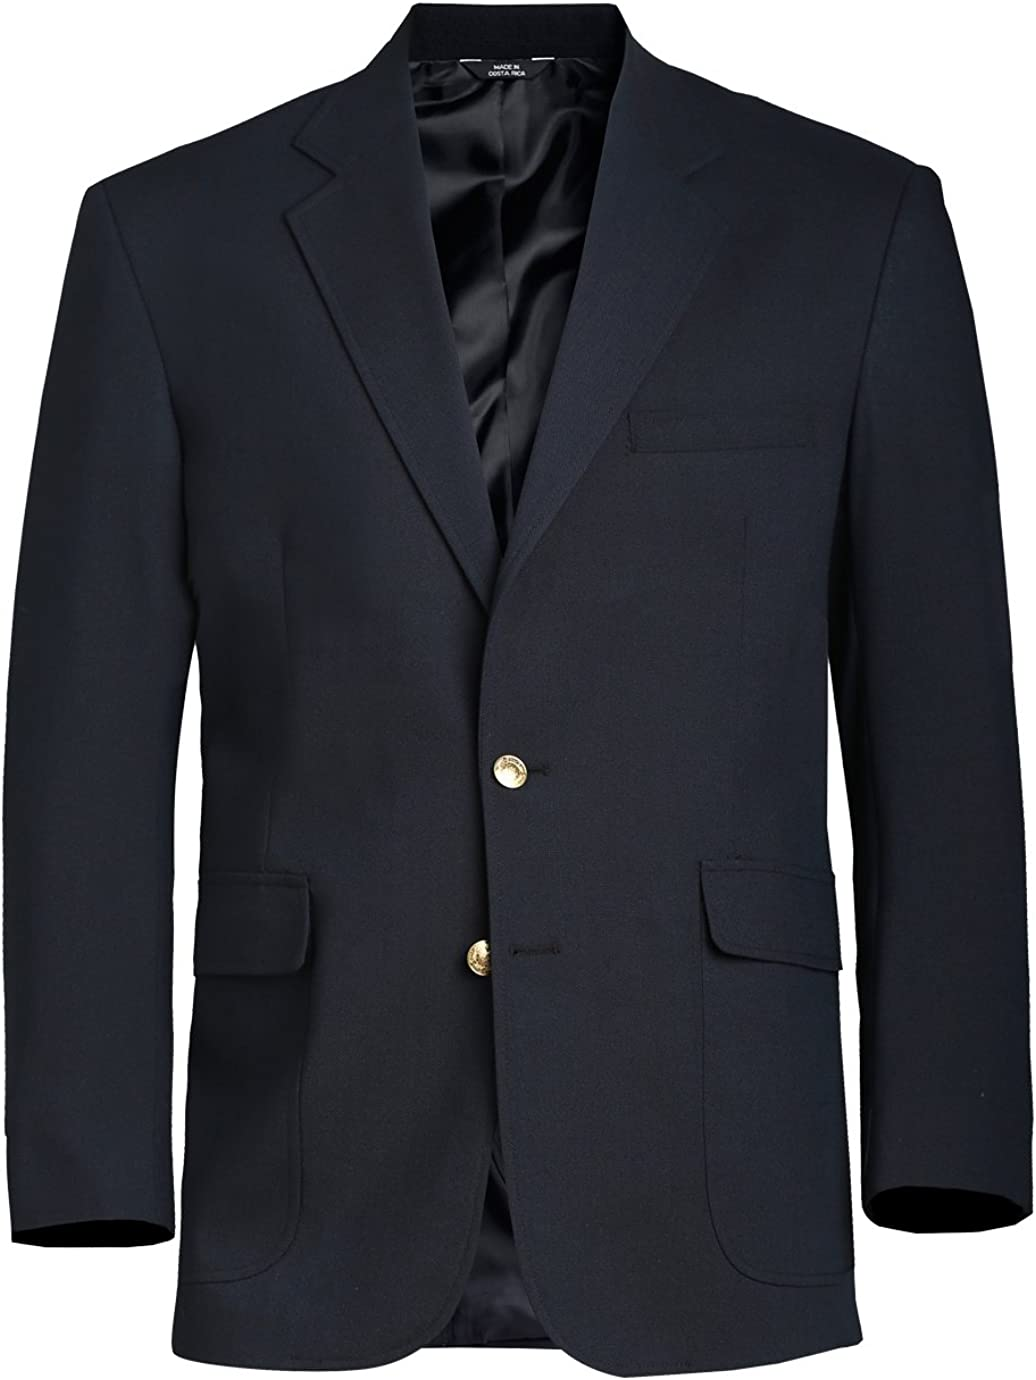 Ed Garments Men's Fully Lined Hopsack Single Breasted Blazer, NAVY, Tall